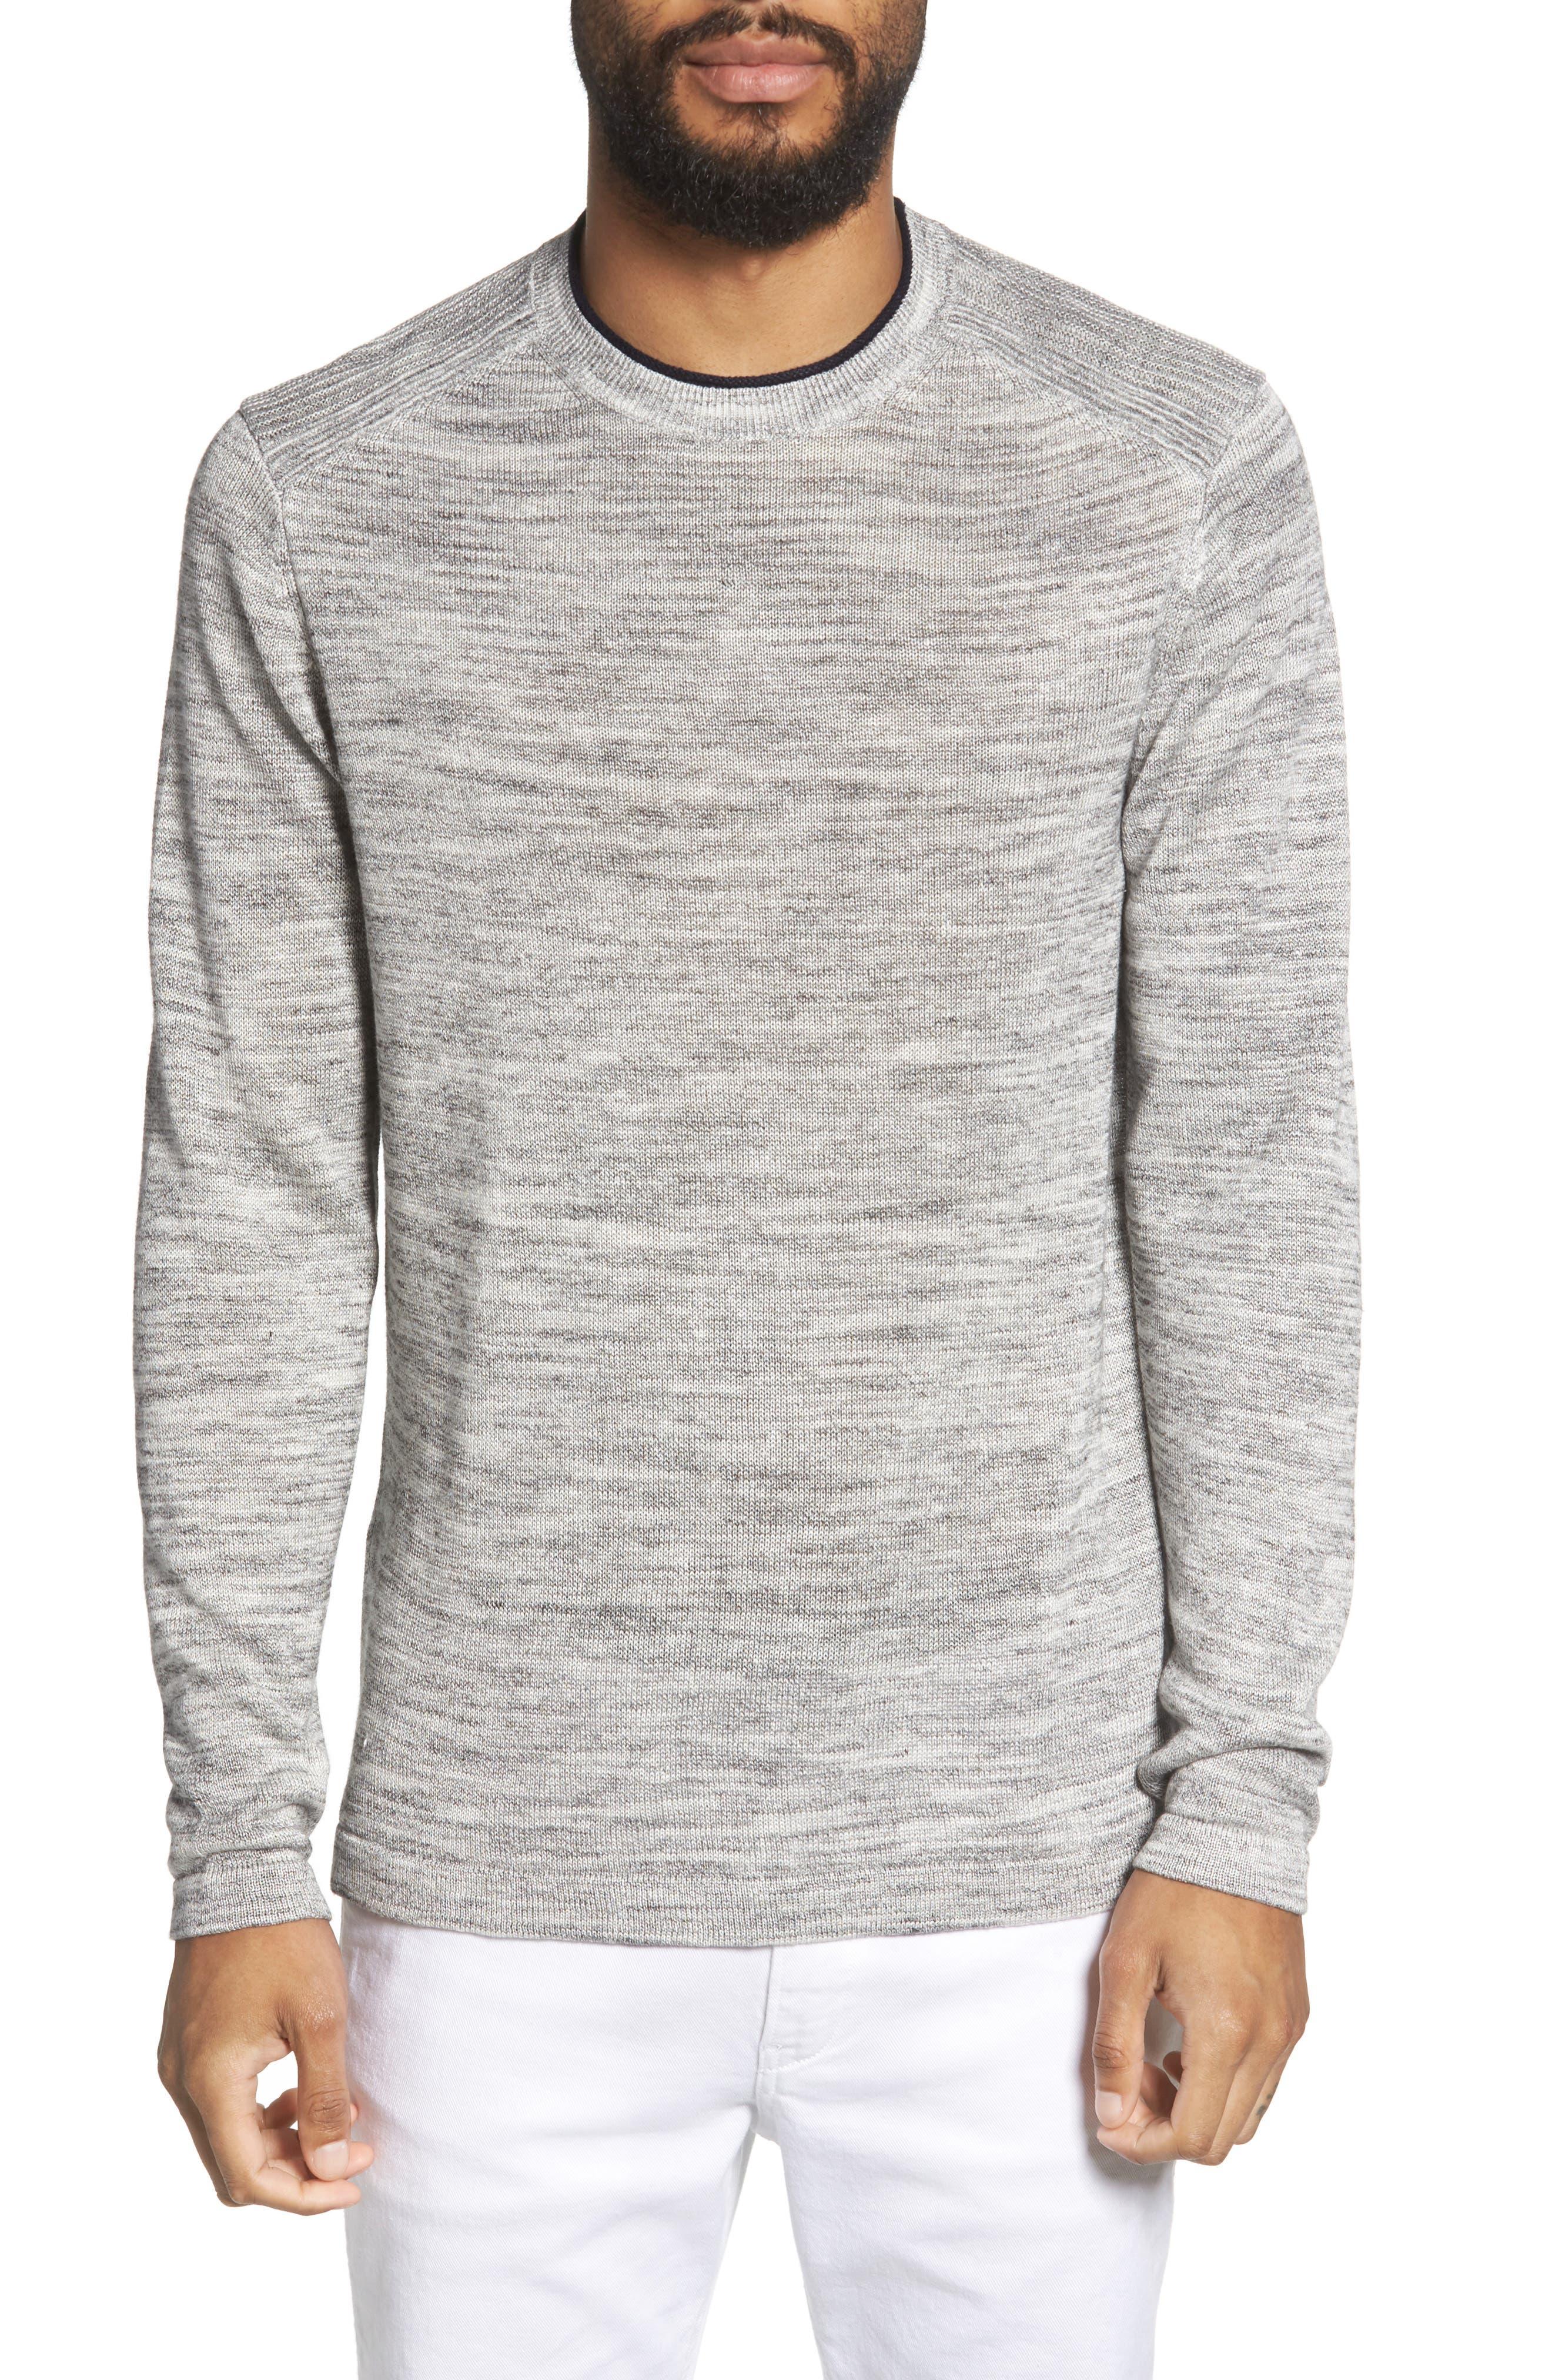 Inzone Crewneck Linen Blend Sweater,                         Main,                         color, 050